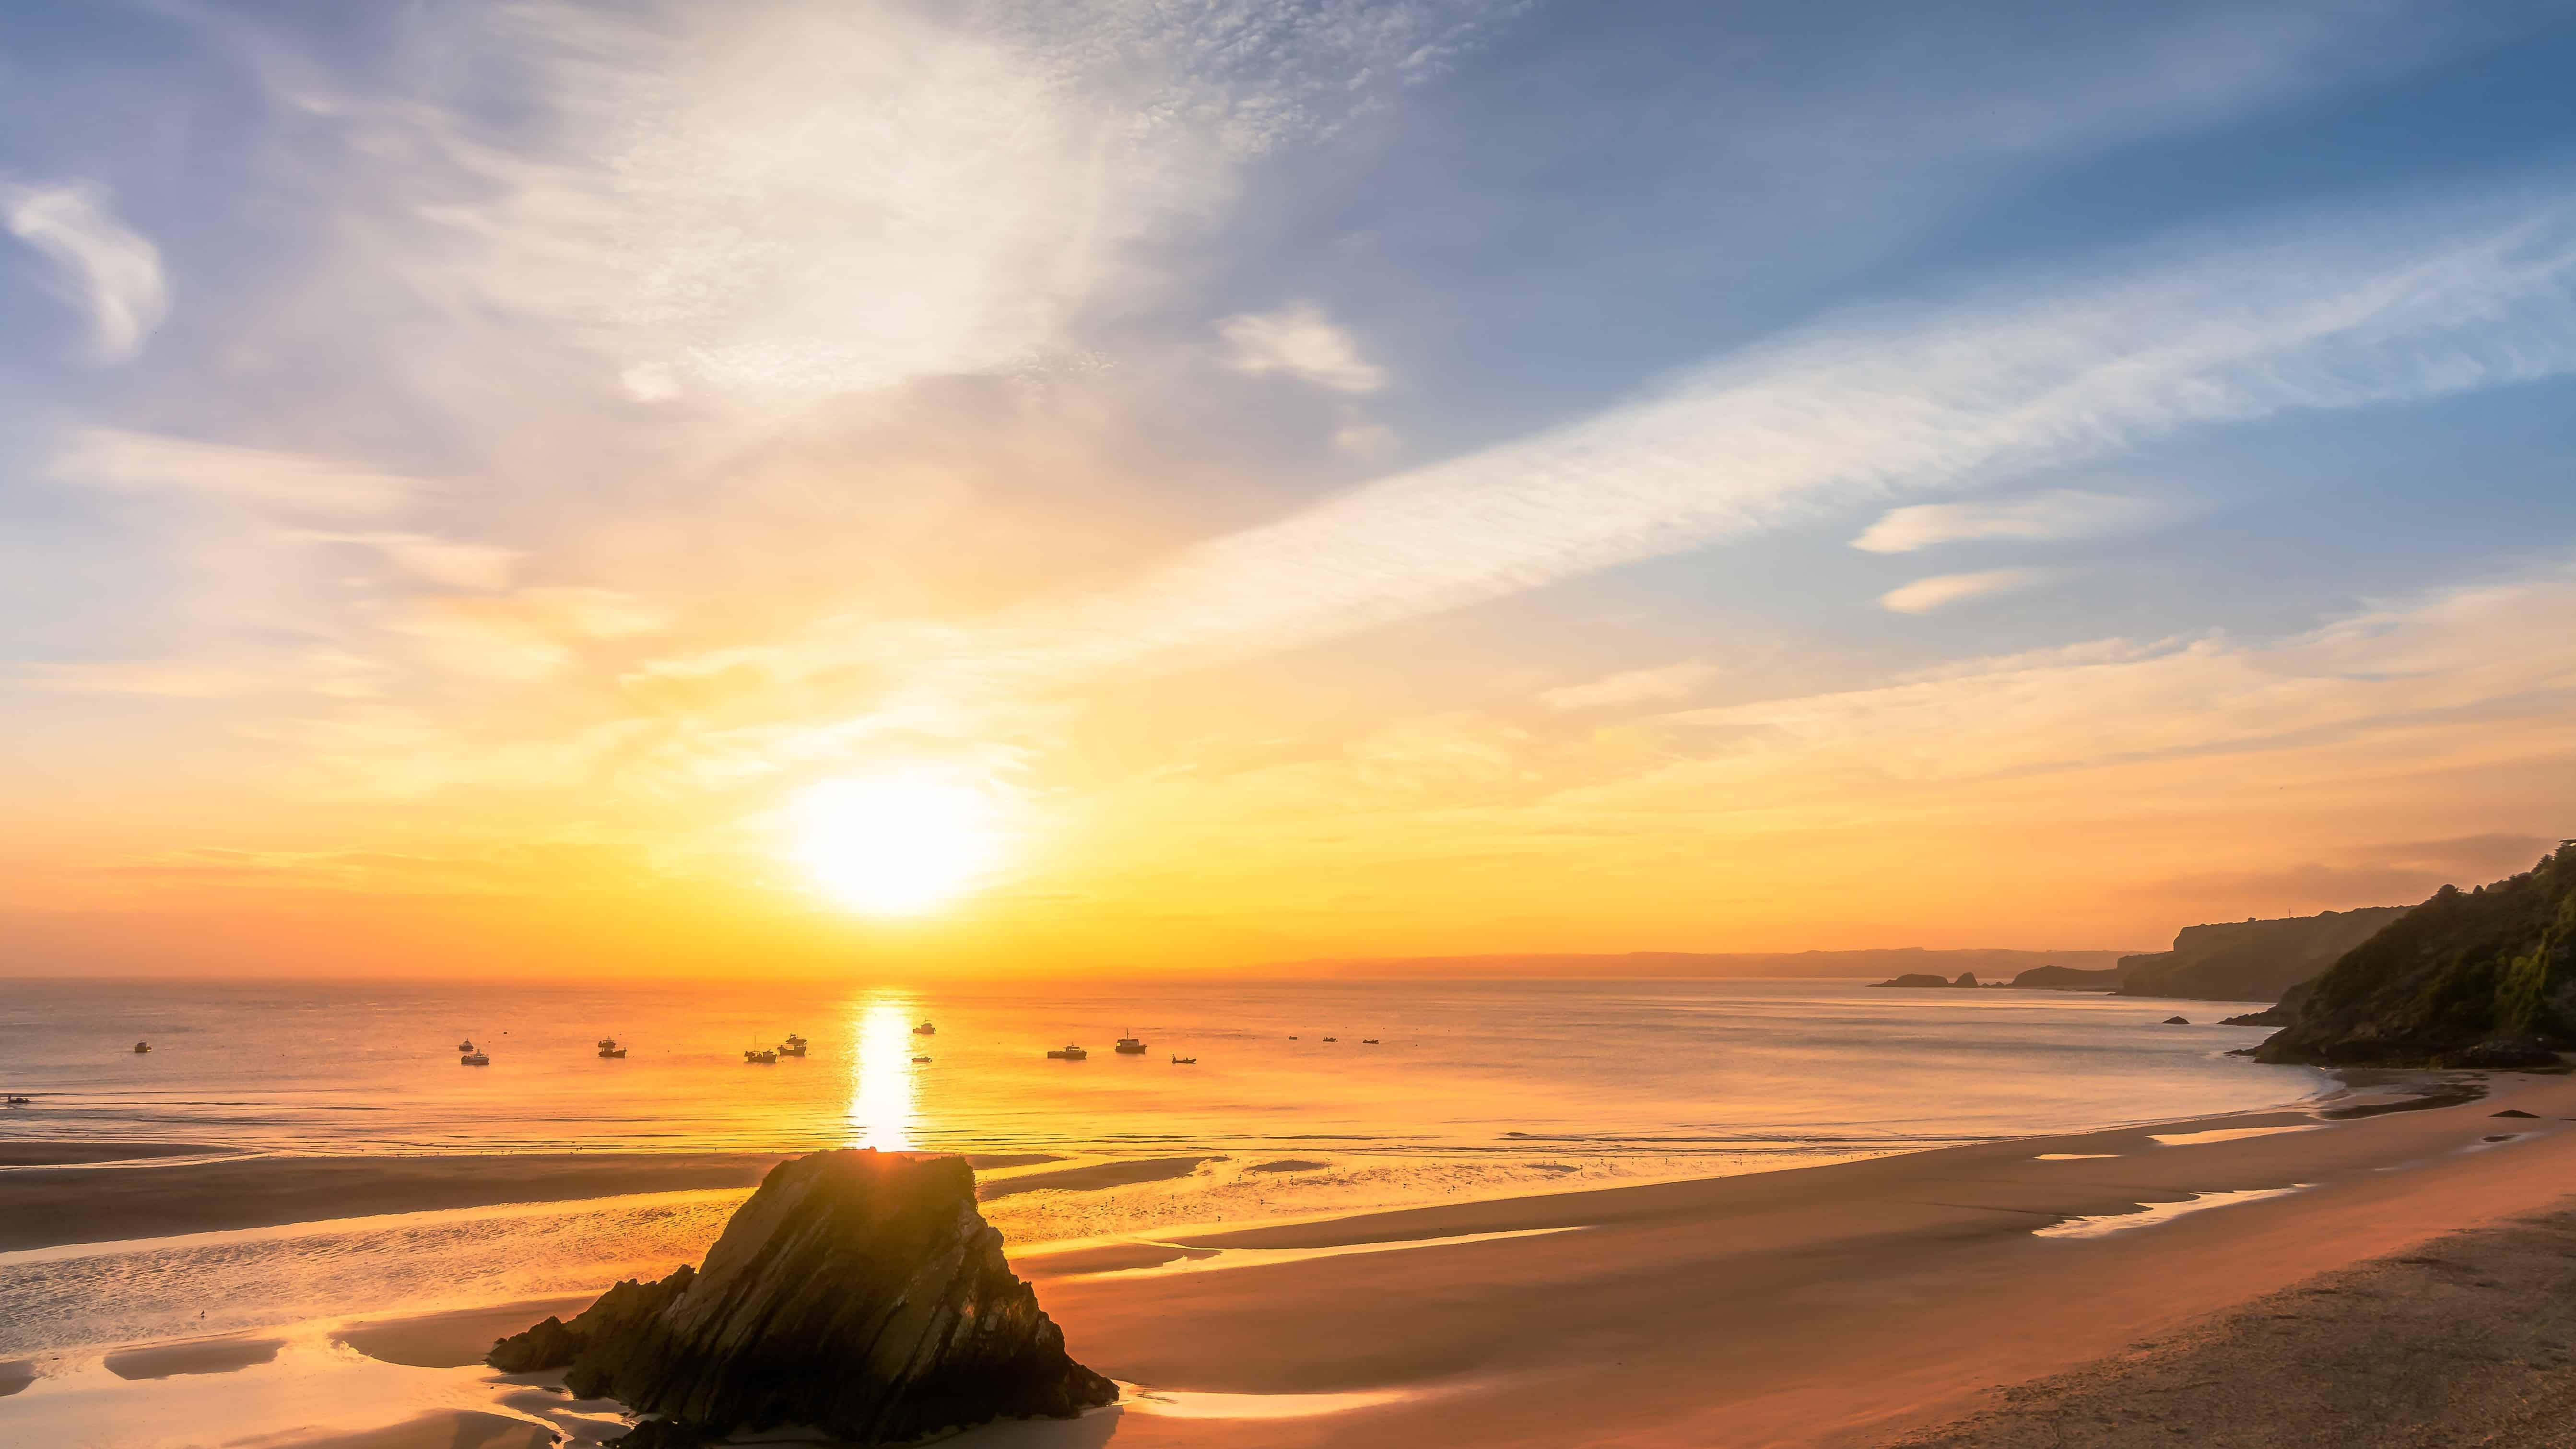 Sea Sun Water Dusk Beach Sunset Ocean Sand Sunrise